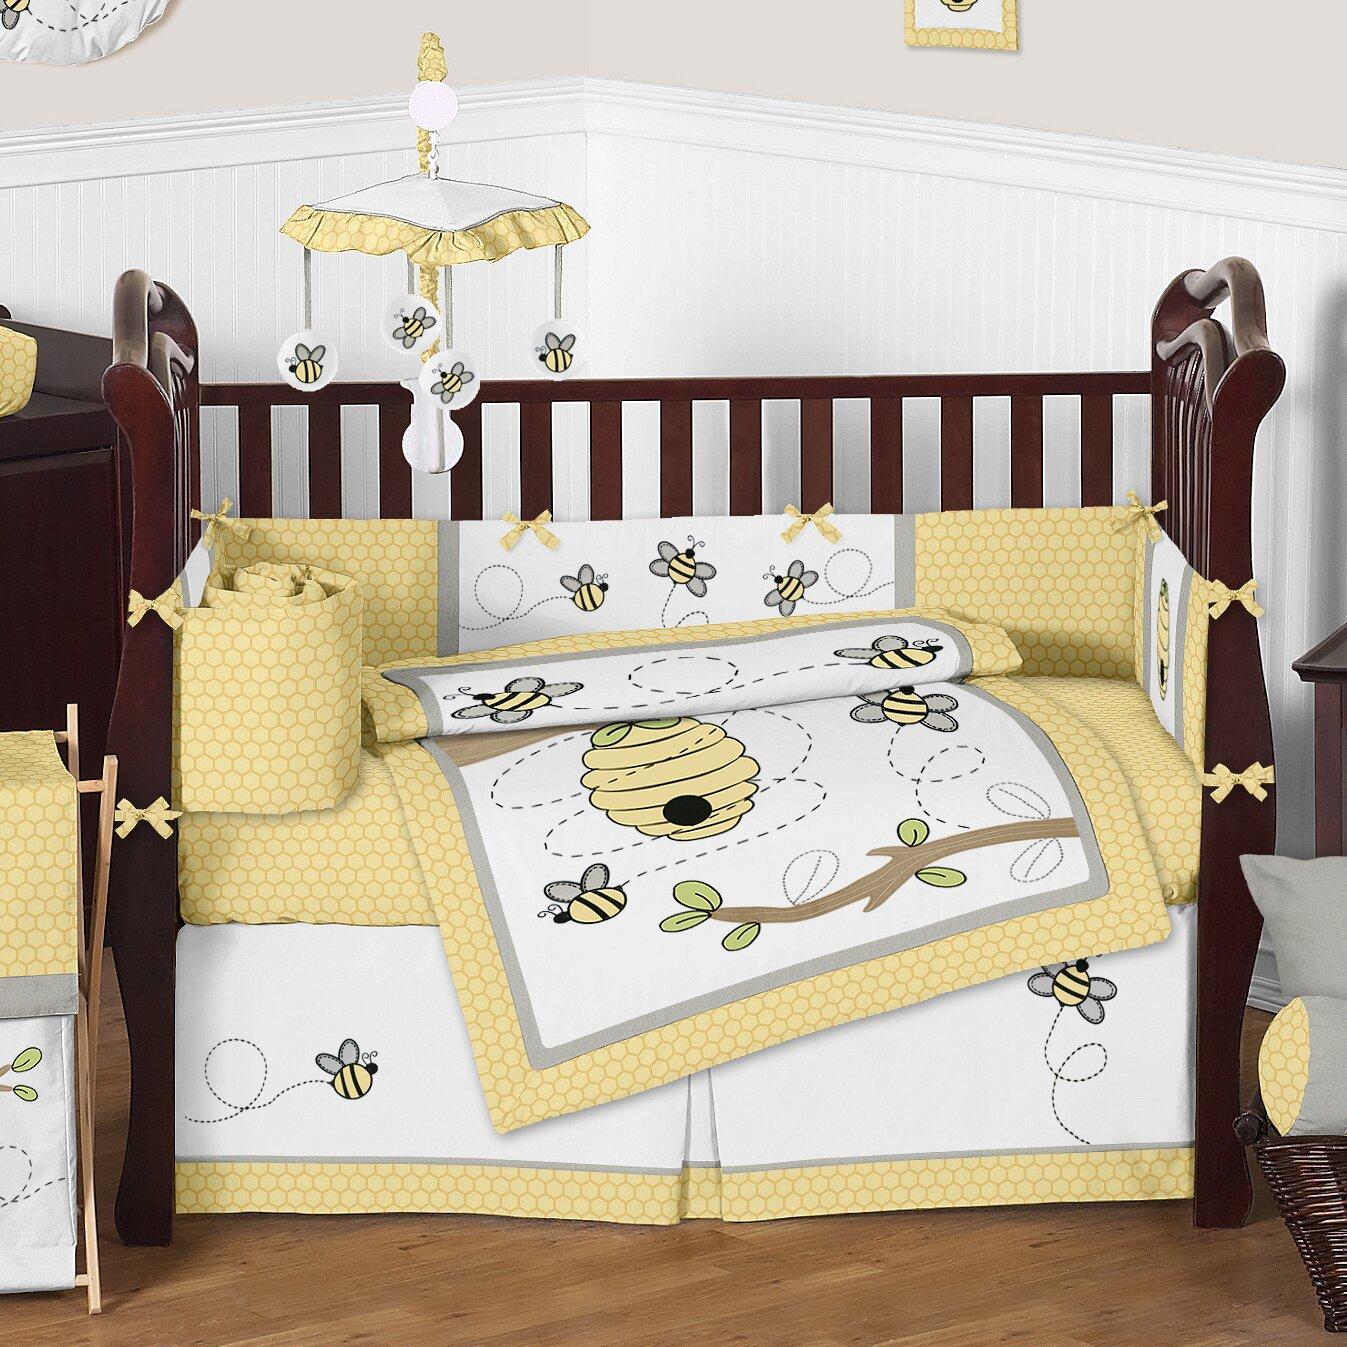 Sweet Jojo Designs Honey Bee 9 Piece Crib Bedding Set